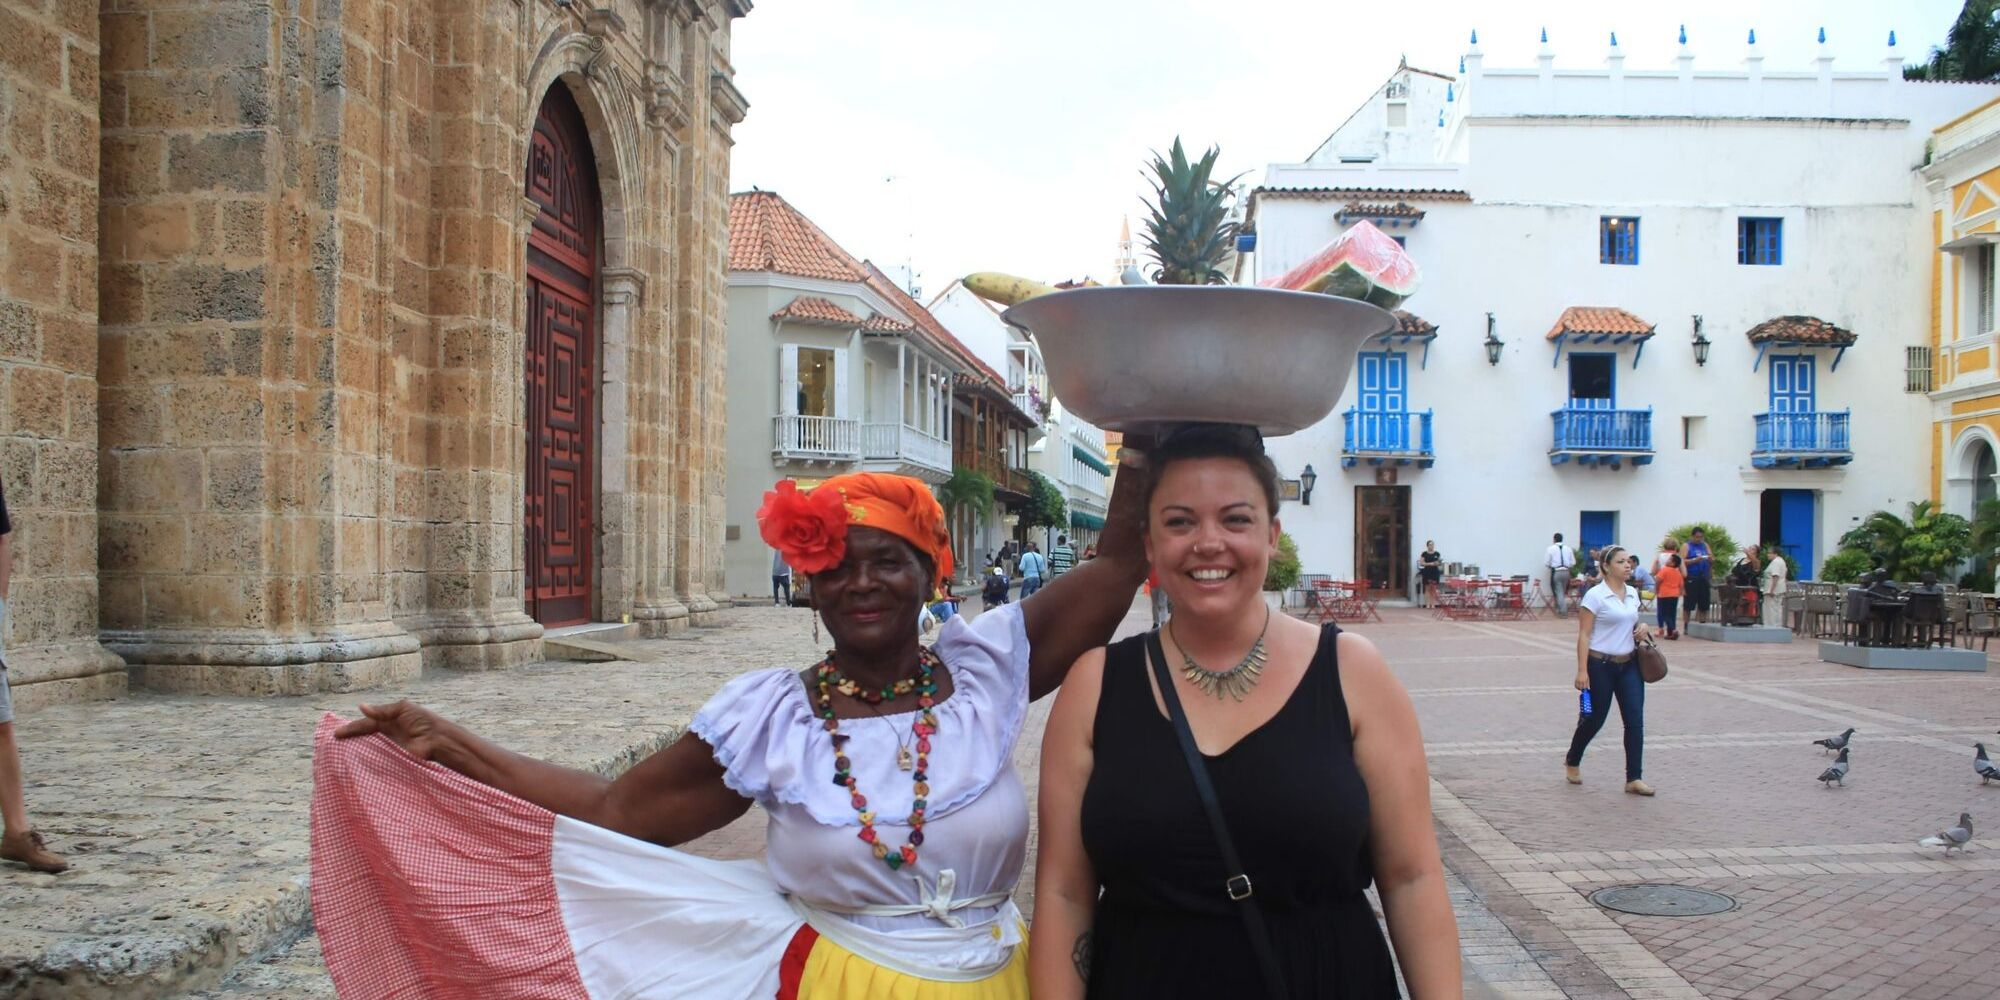 balancing bowl on head at colombia street market